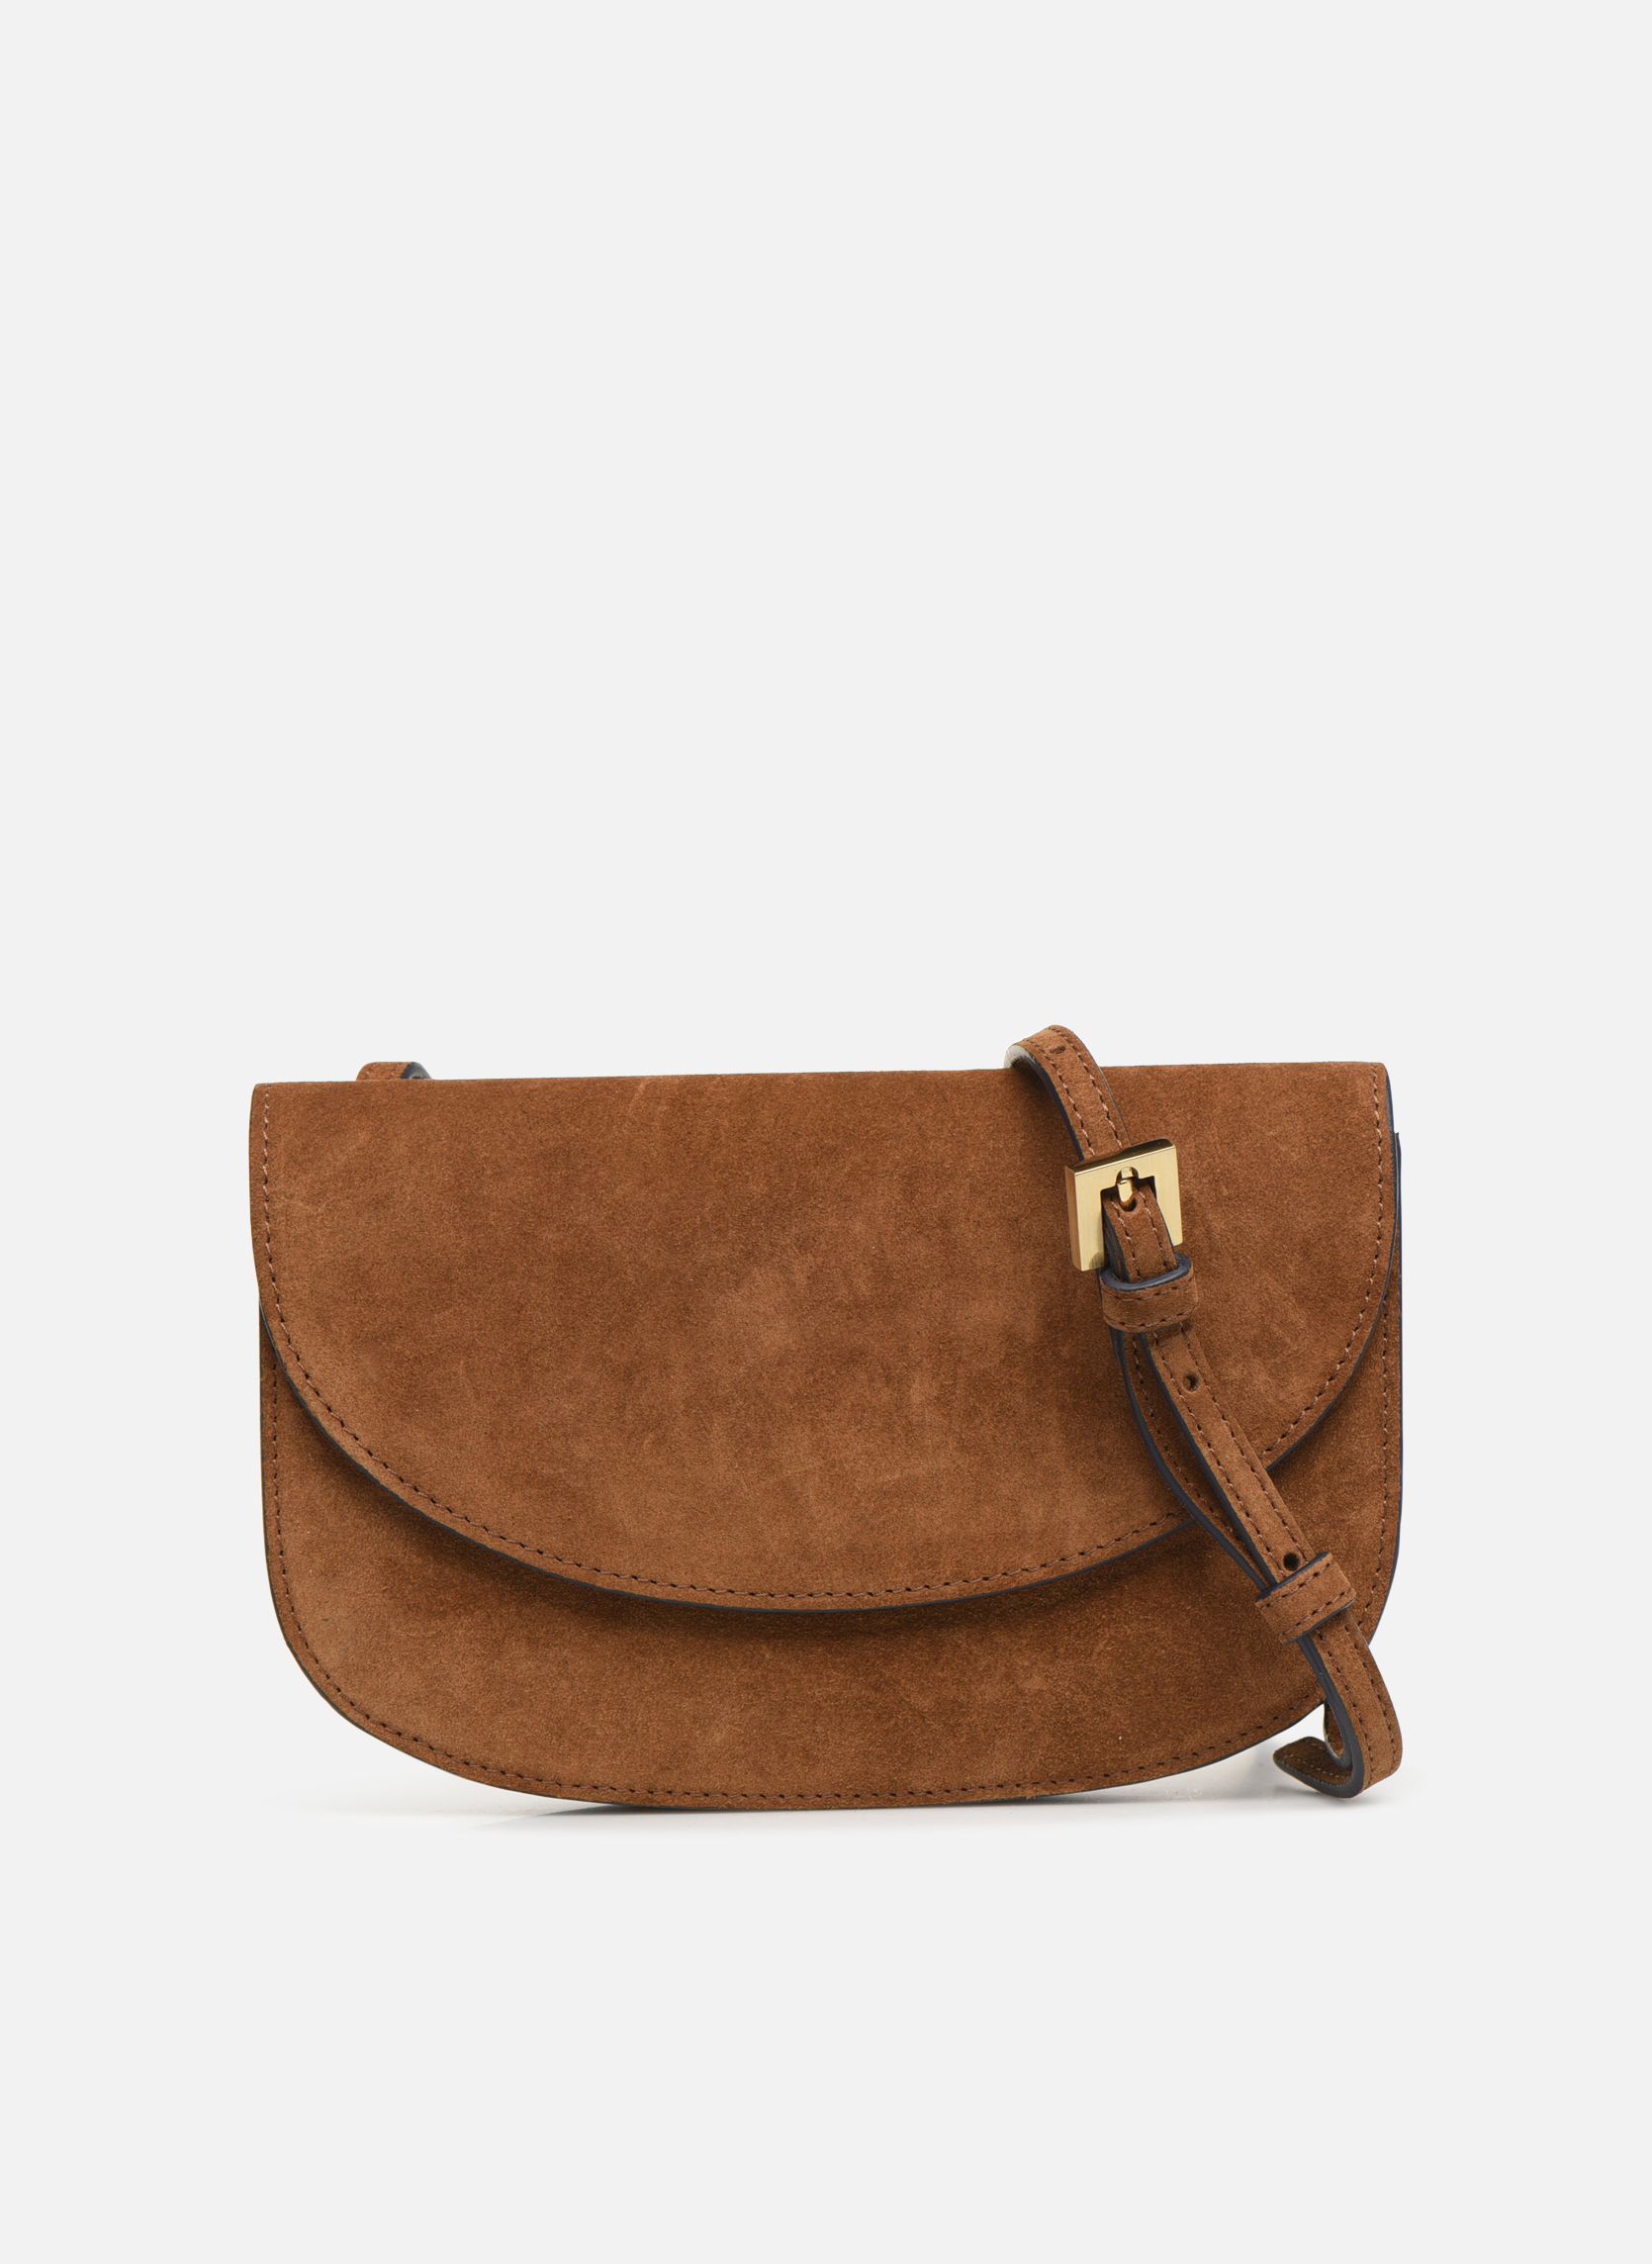 Handbags Avril Gau Mimi C8 Grey Detailed View Pair